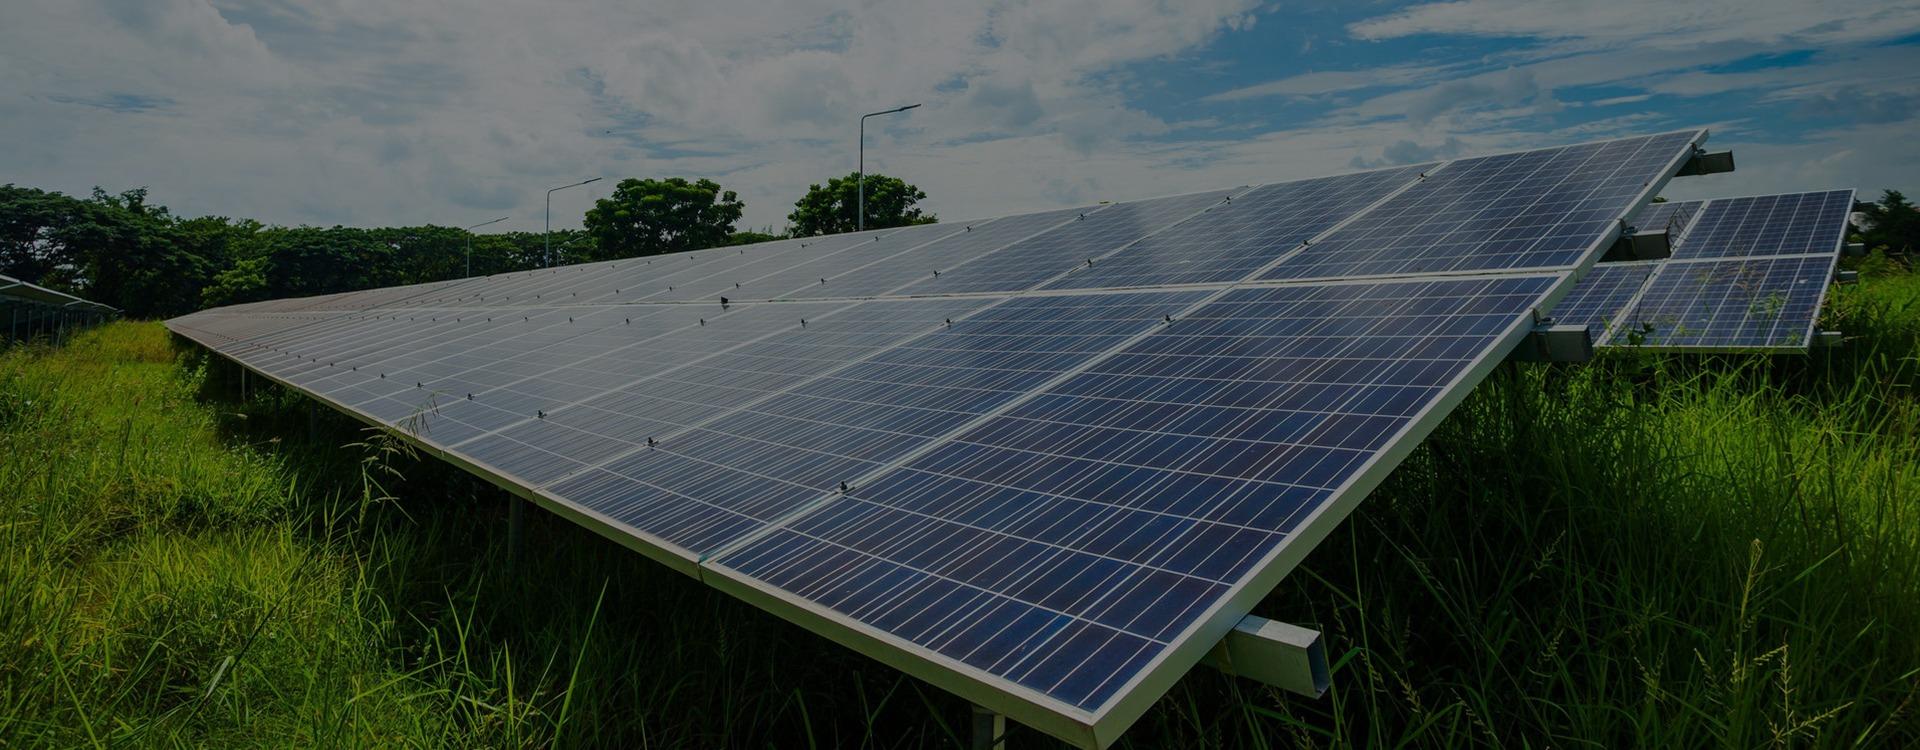 SOLAR-ENERGY-SOLAR-PANELS-NORTHERN-IRELAND